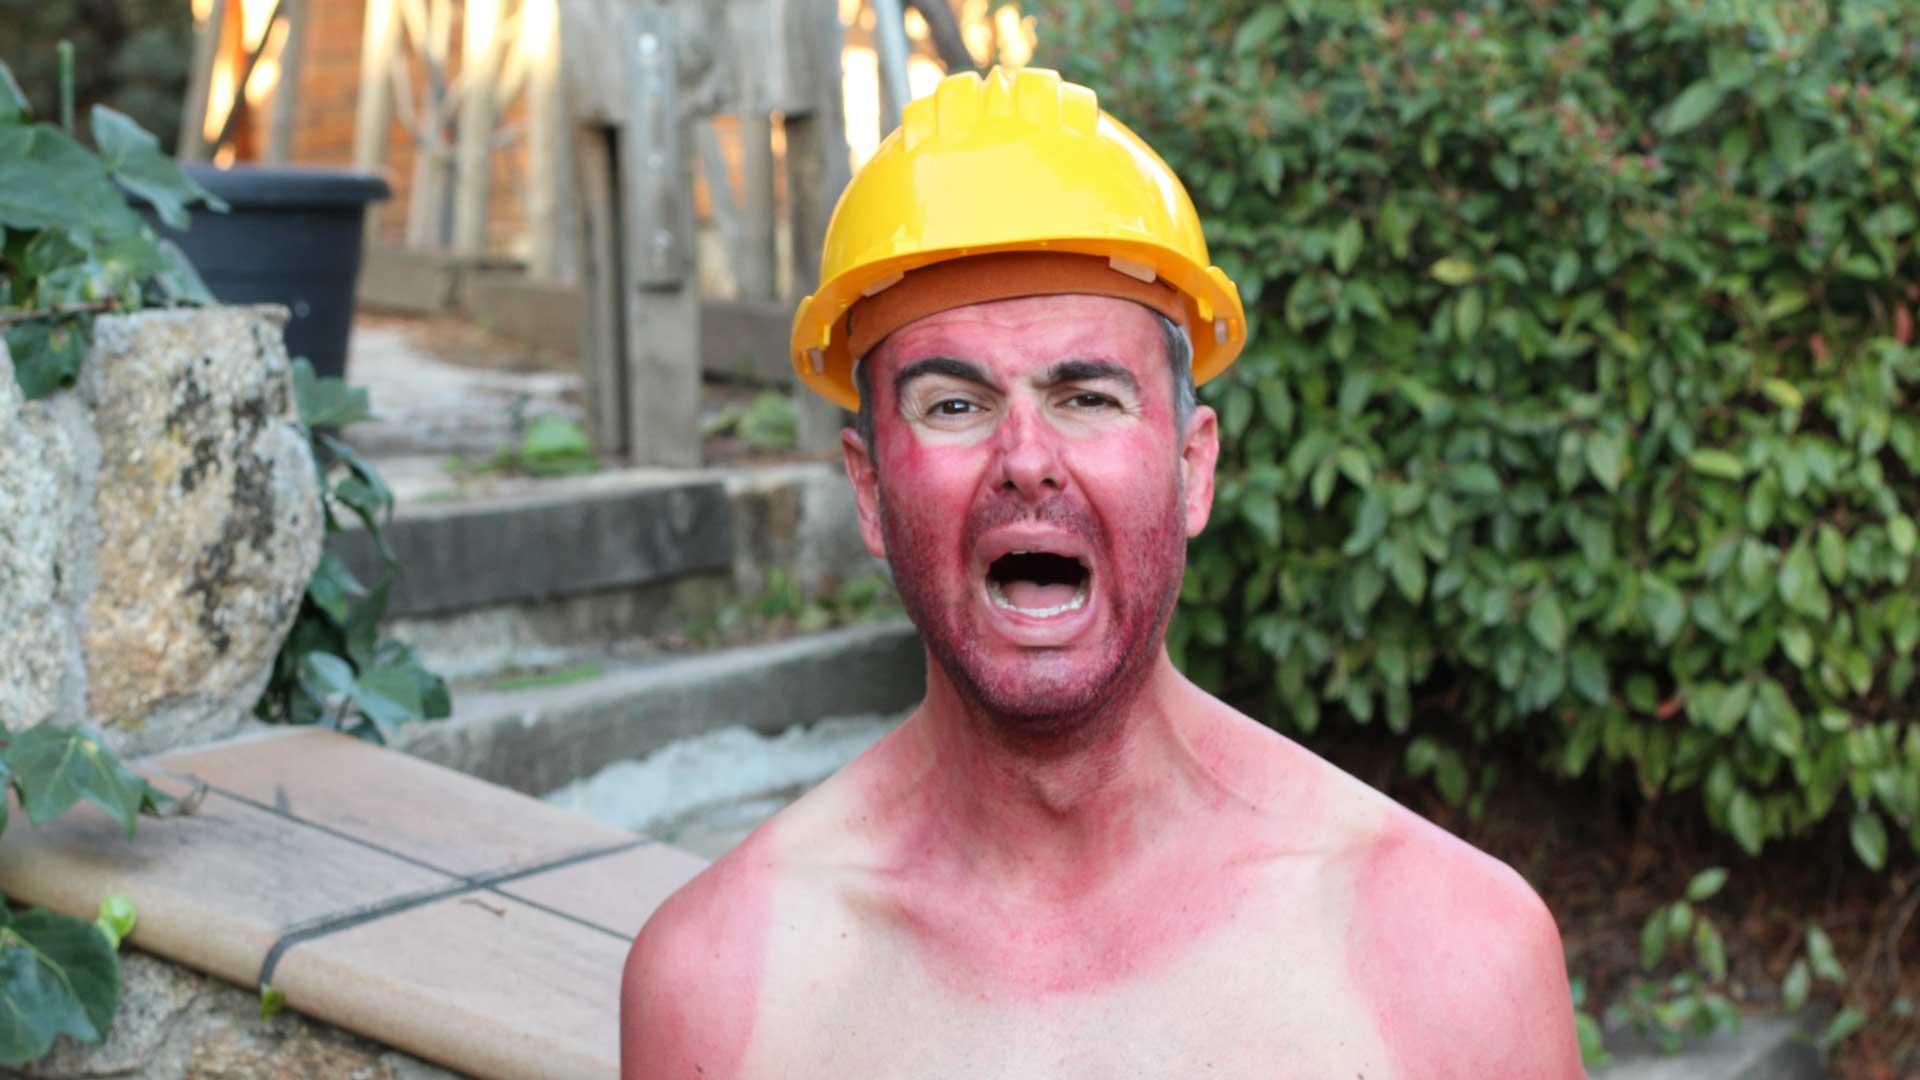 Employee burnt during work